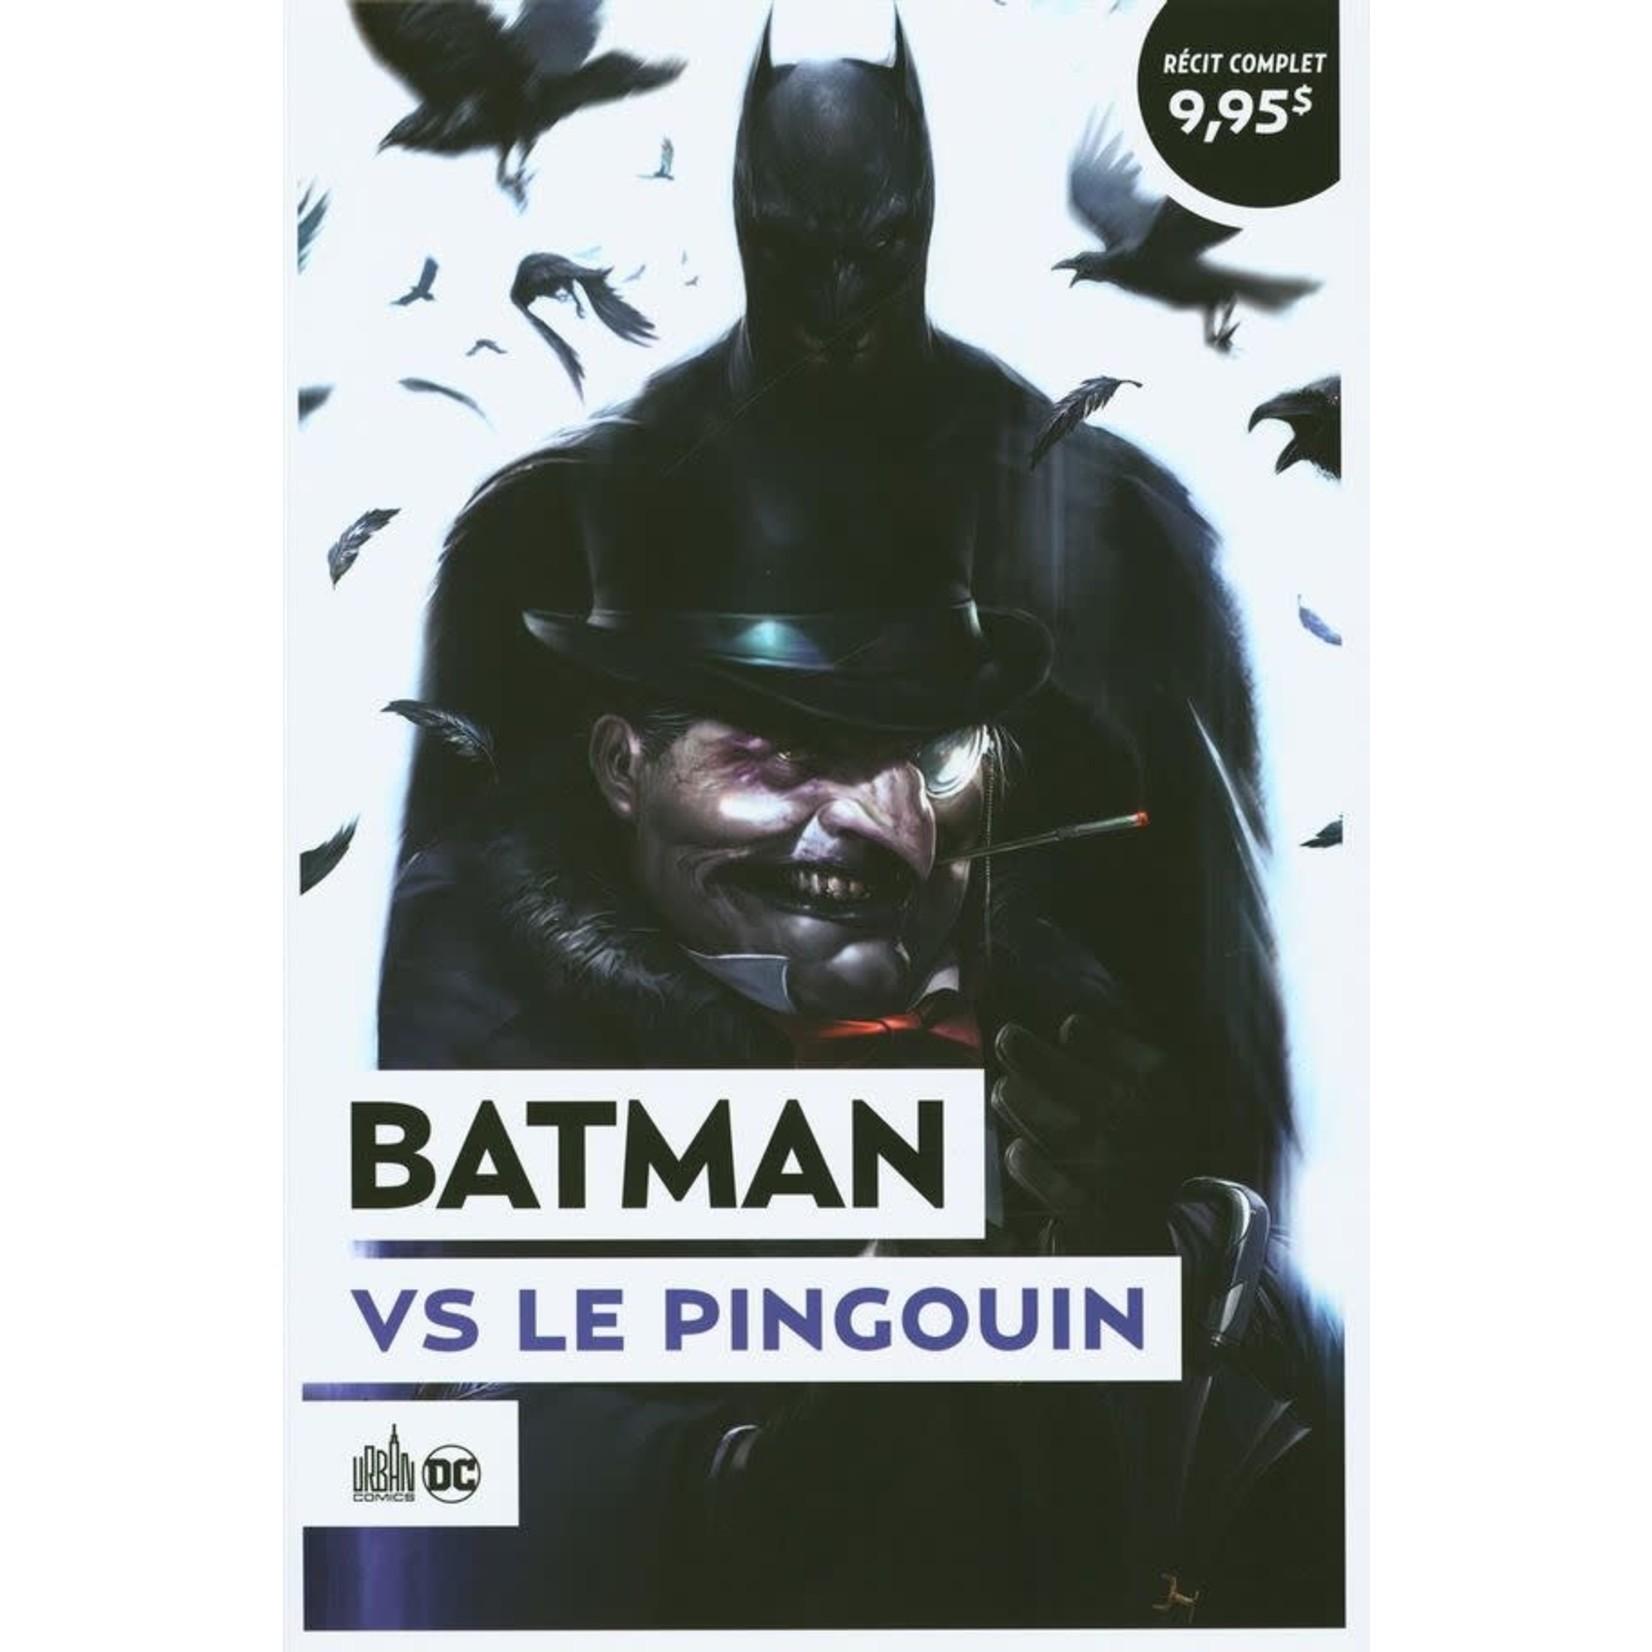 Urban Comics Urban OP 2021 #3: Batman vs Le Pingouin